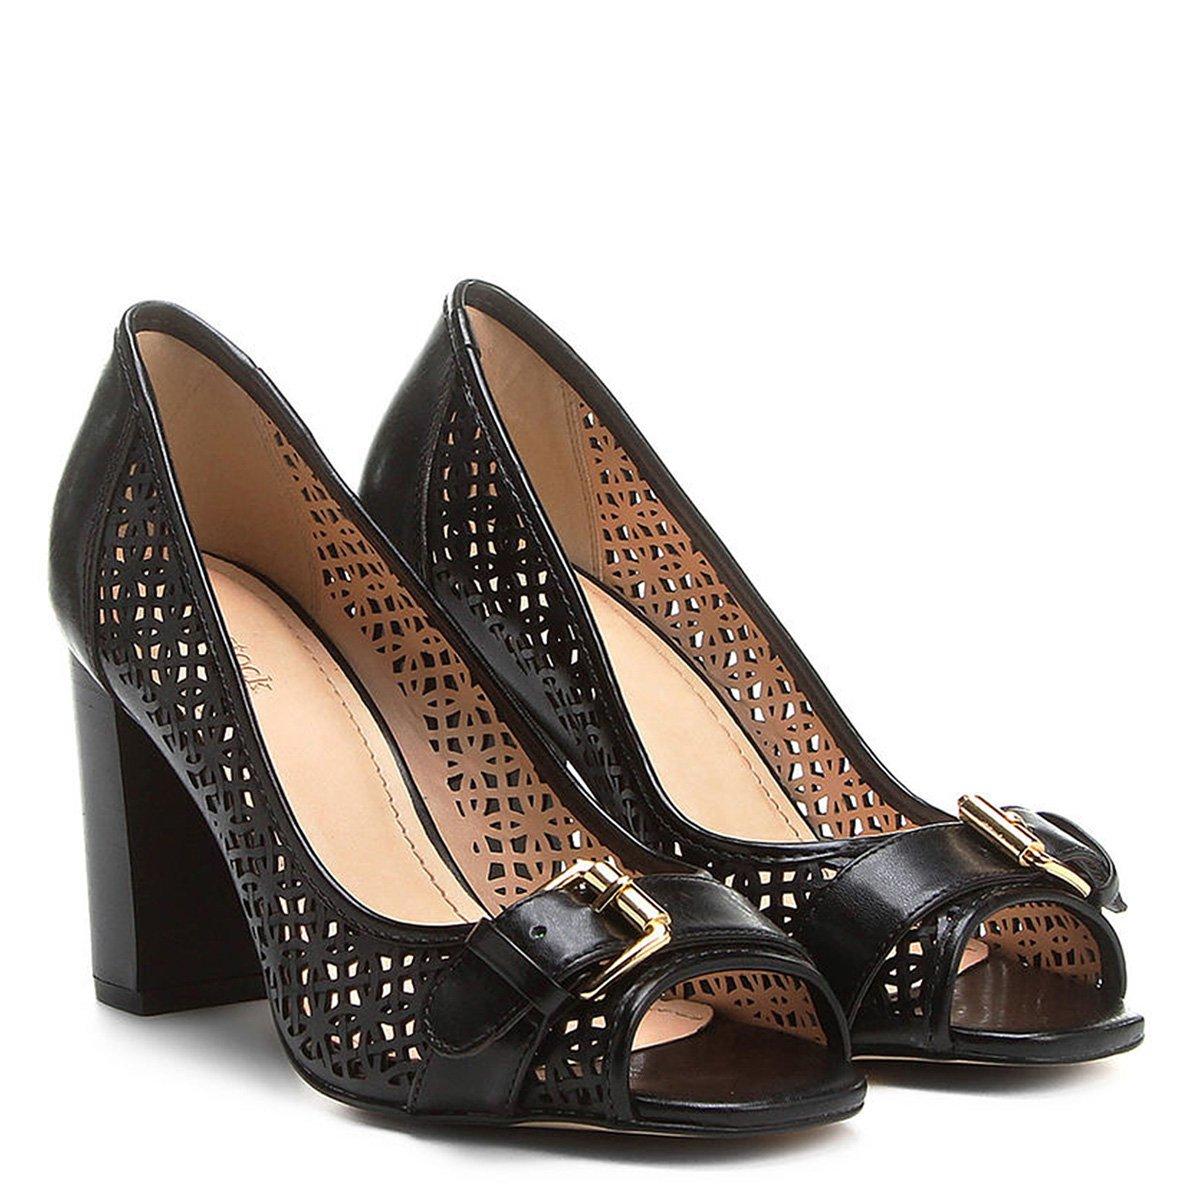 287b7f6057 Peep Toe Shoestock Laser - Compre Agora